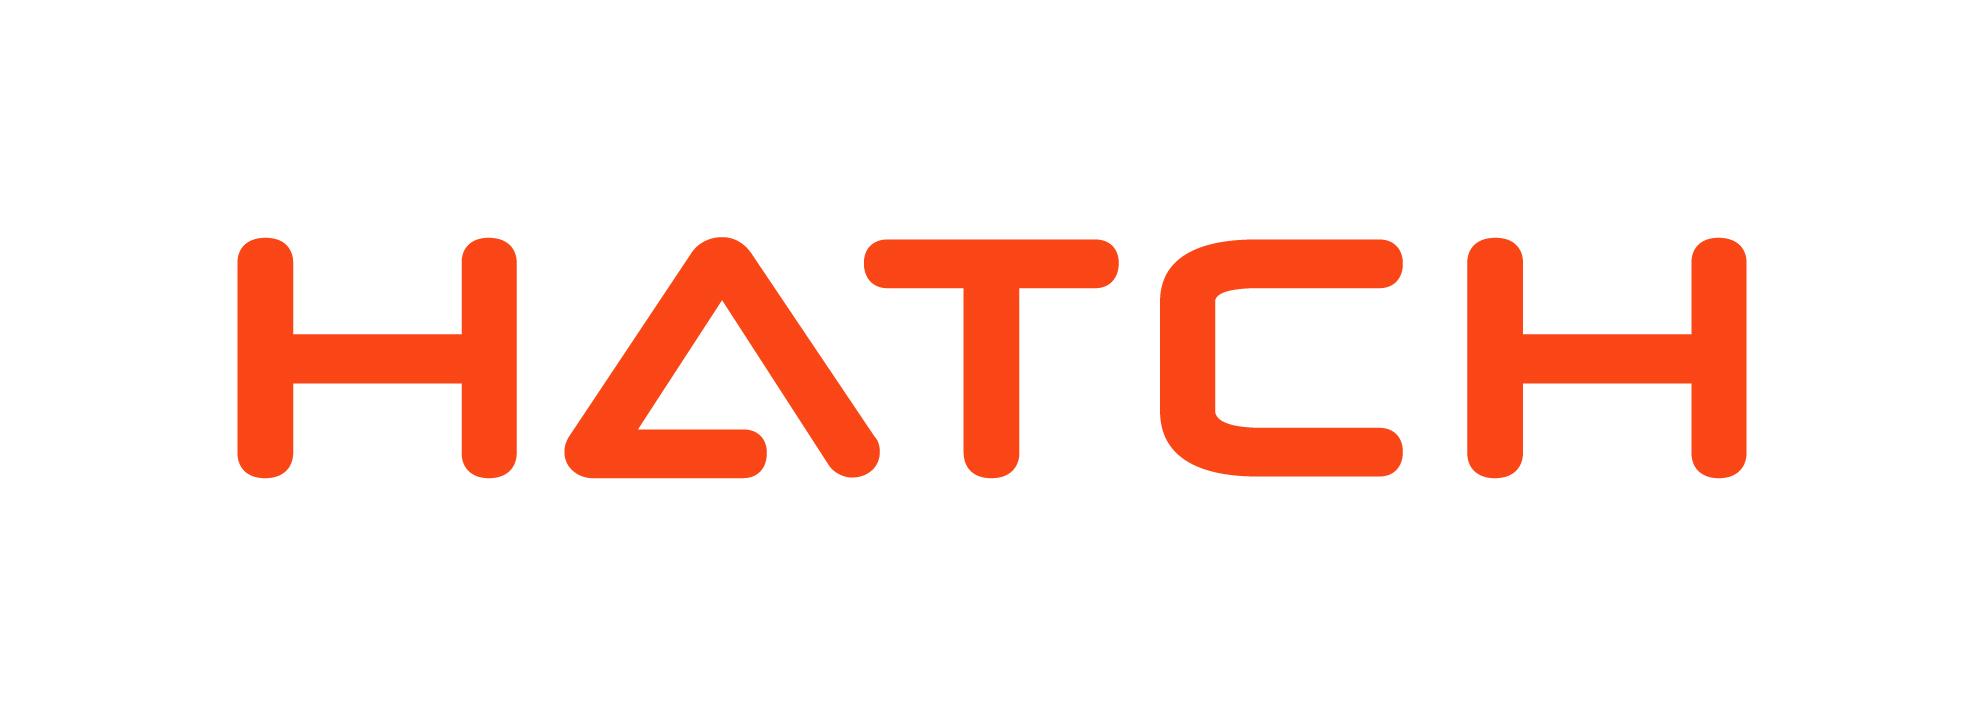 http://www.cemf.ca/img/DonorImages/Hatch_Logo.jpg